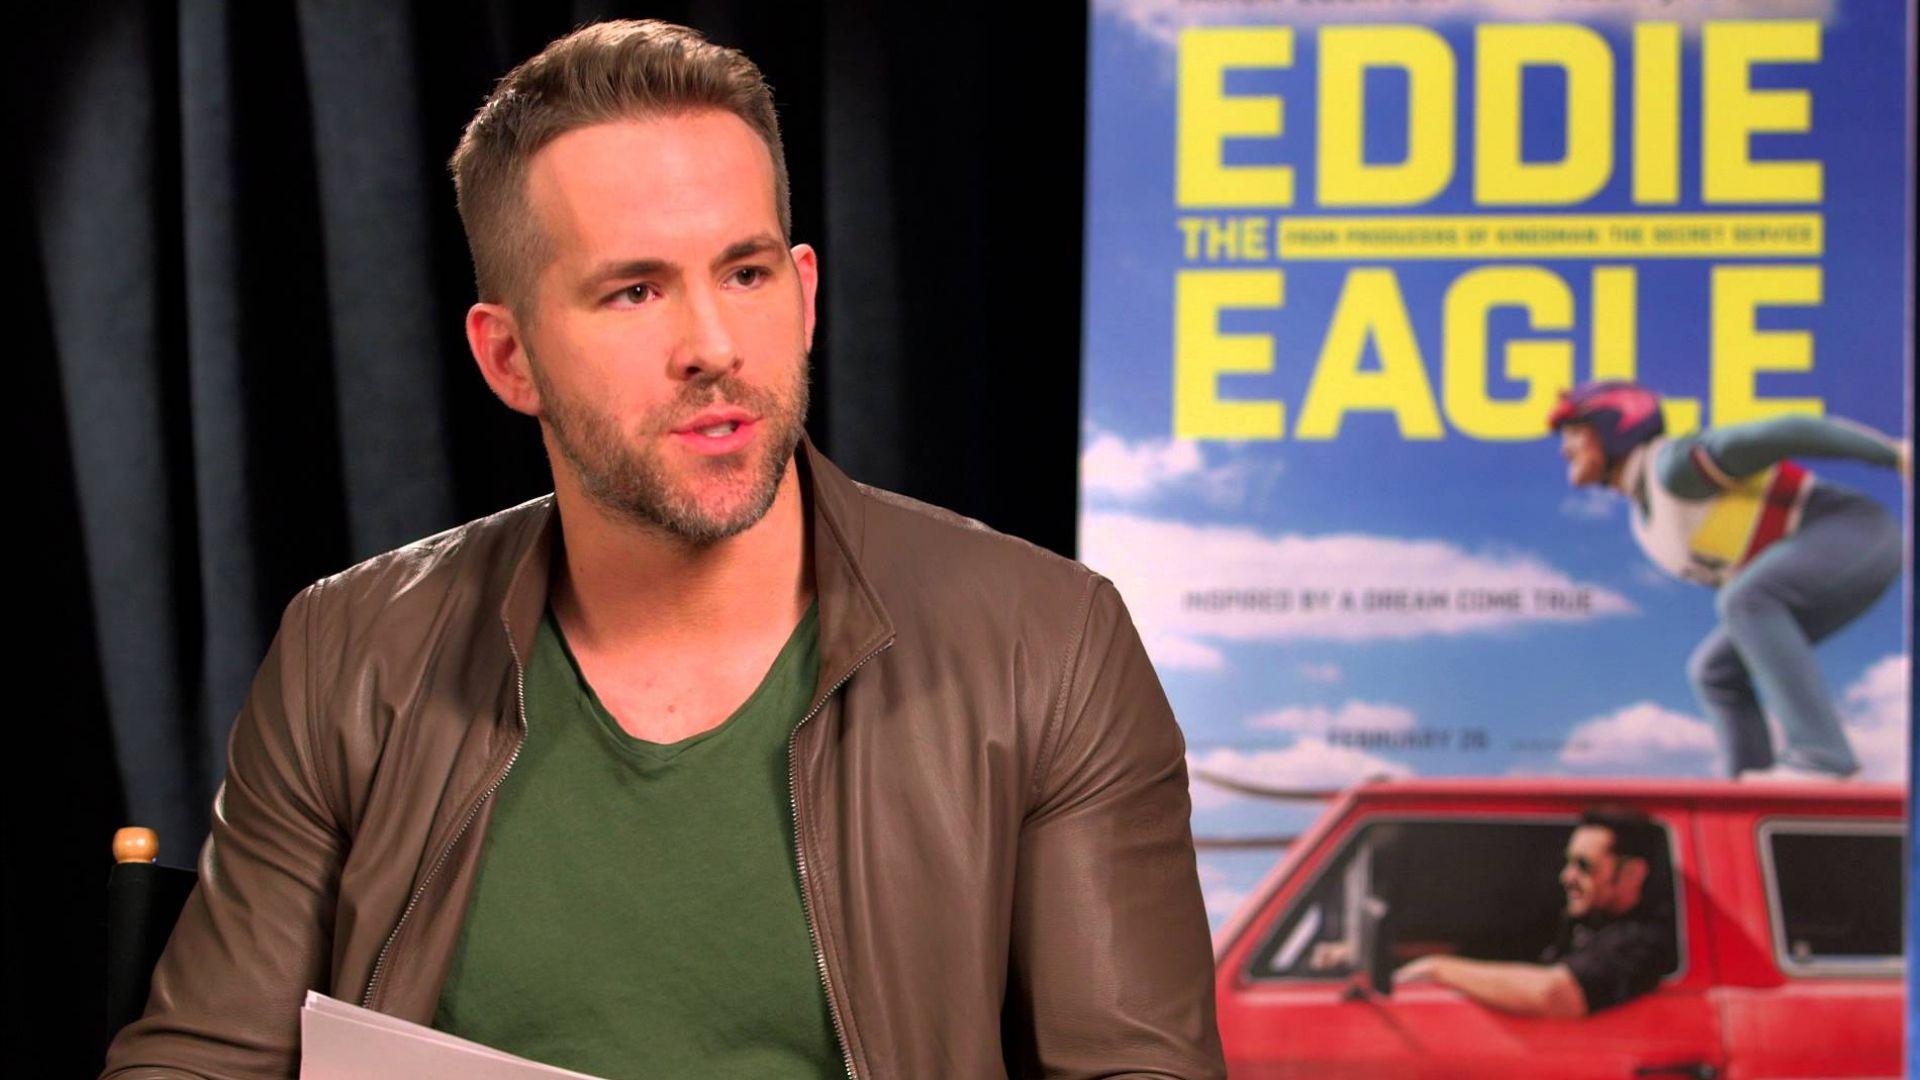 Ryan Reynolds interviews Hugh Jackman in this hilarious shor